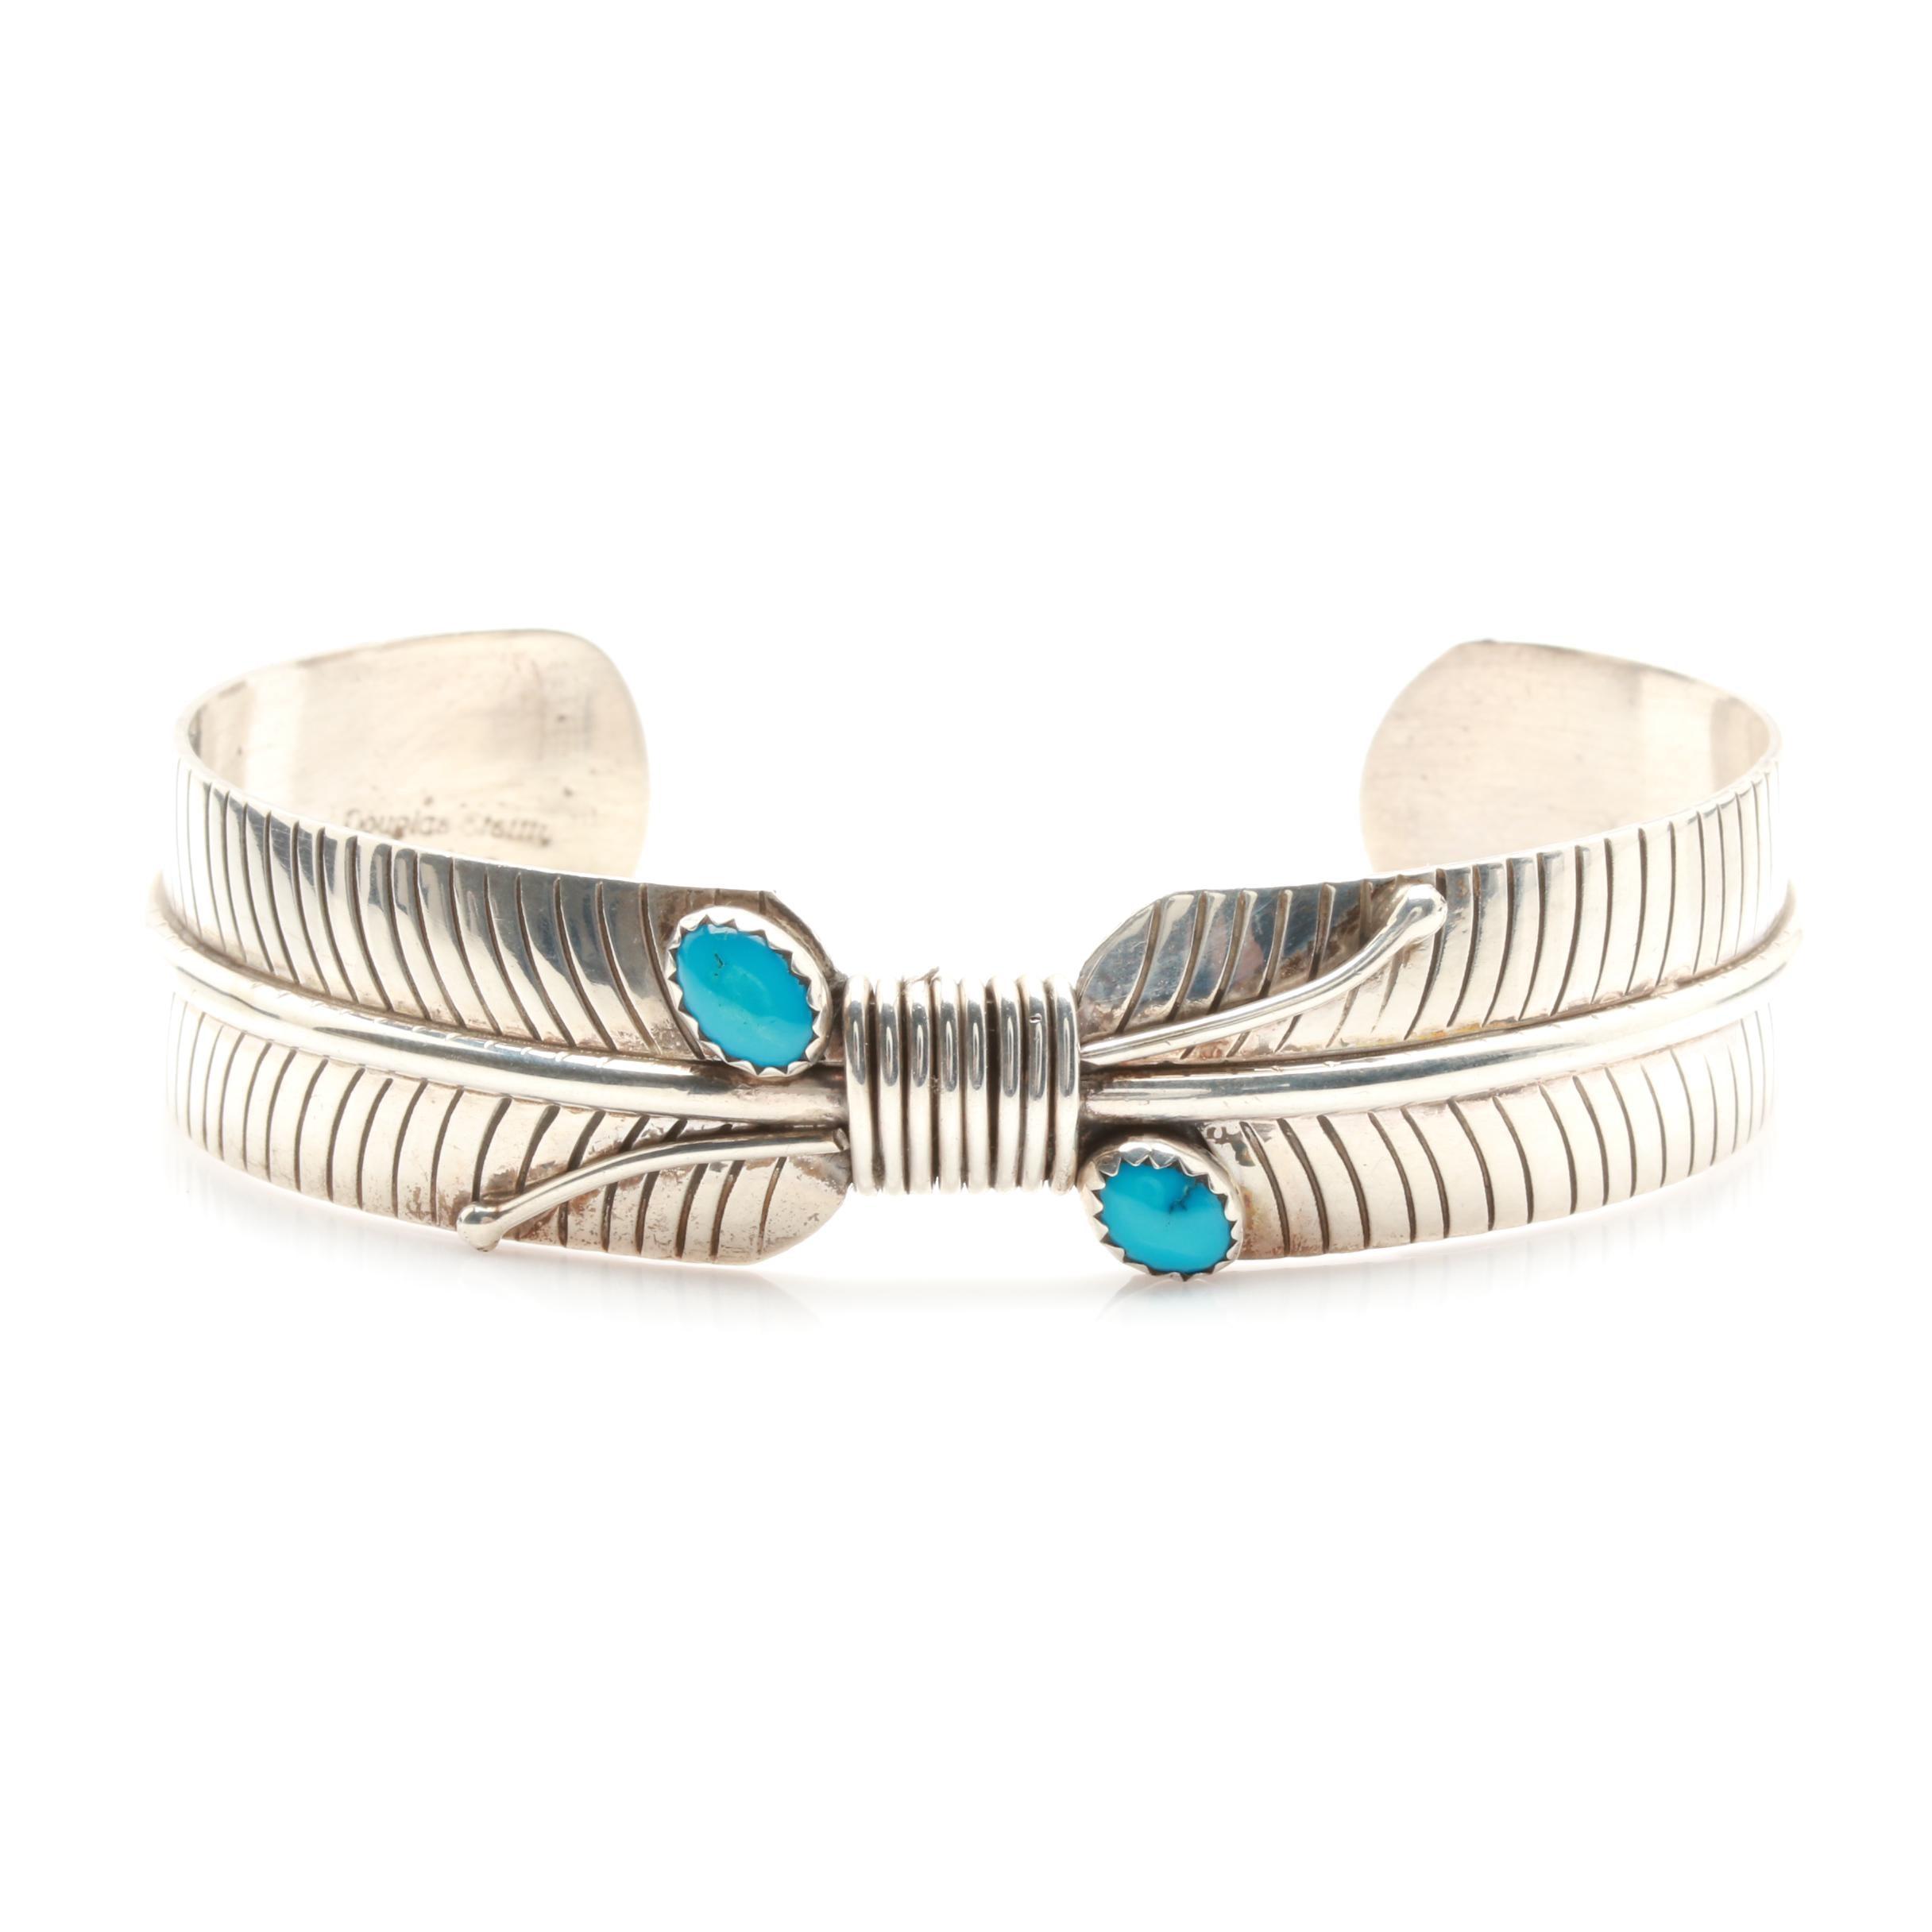 Douglas Etsitty Navajo Diné Sterling Silver Turquoise Cuff Bracelet